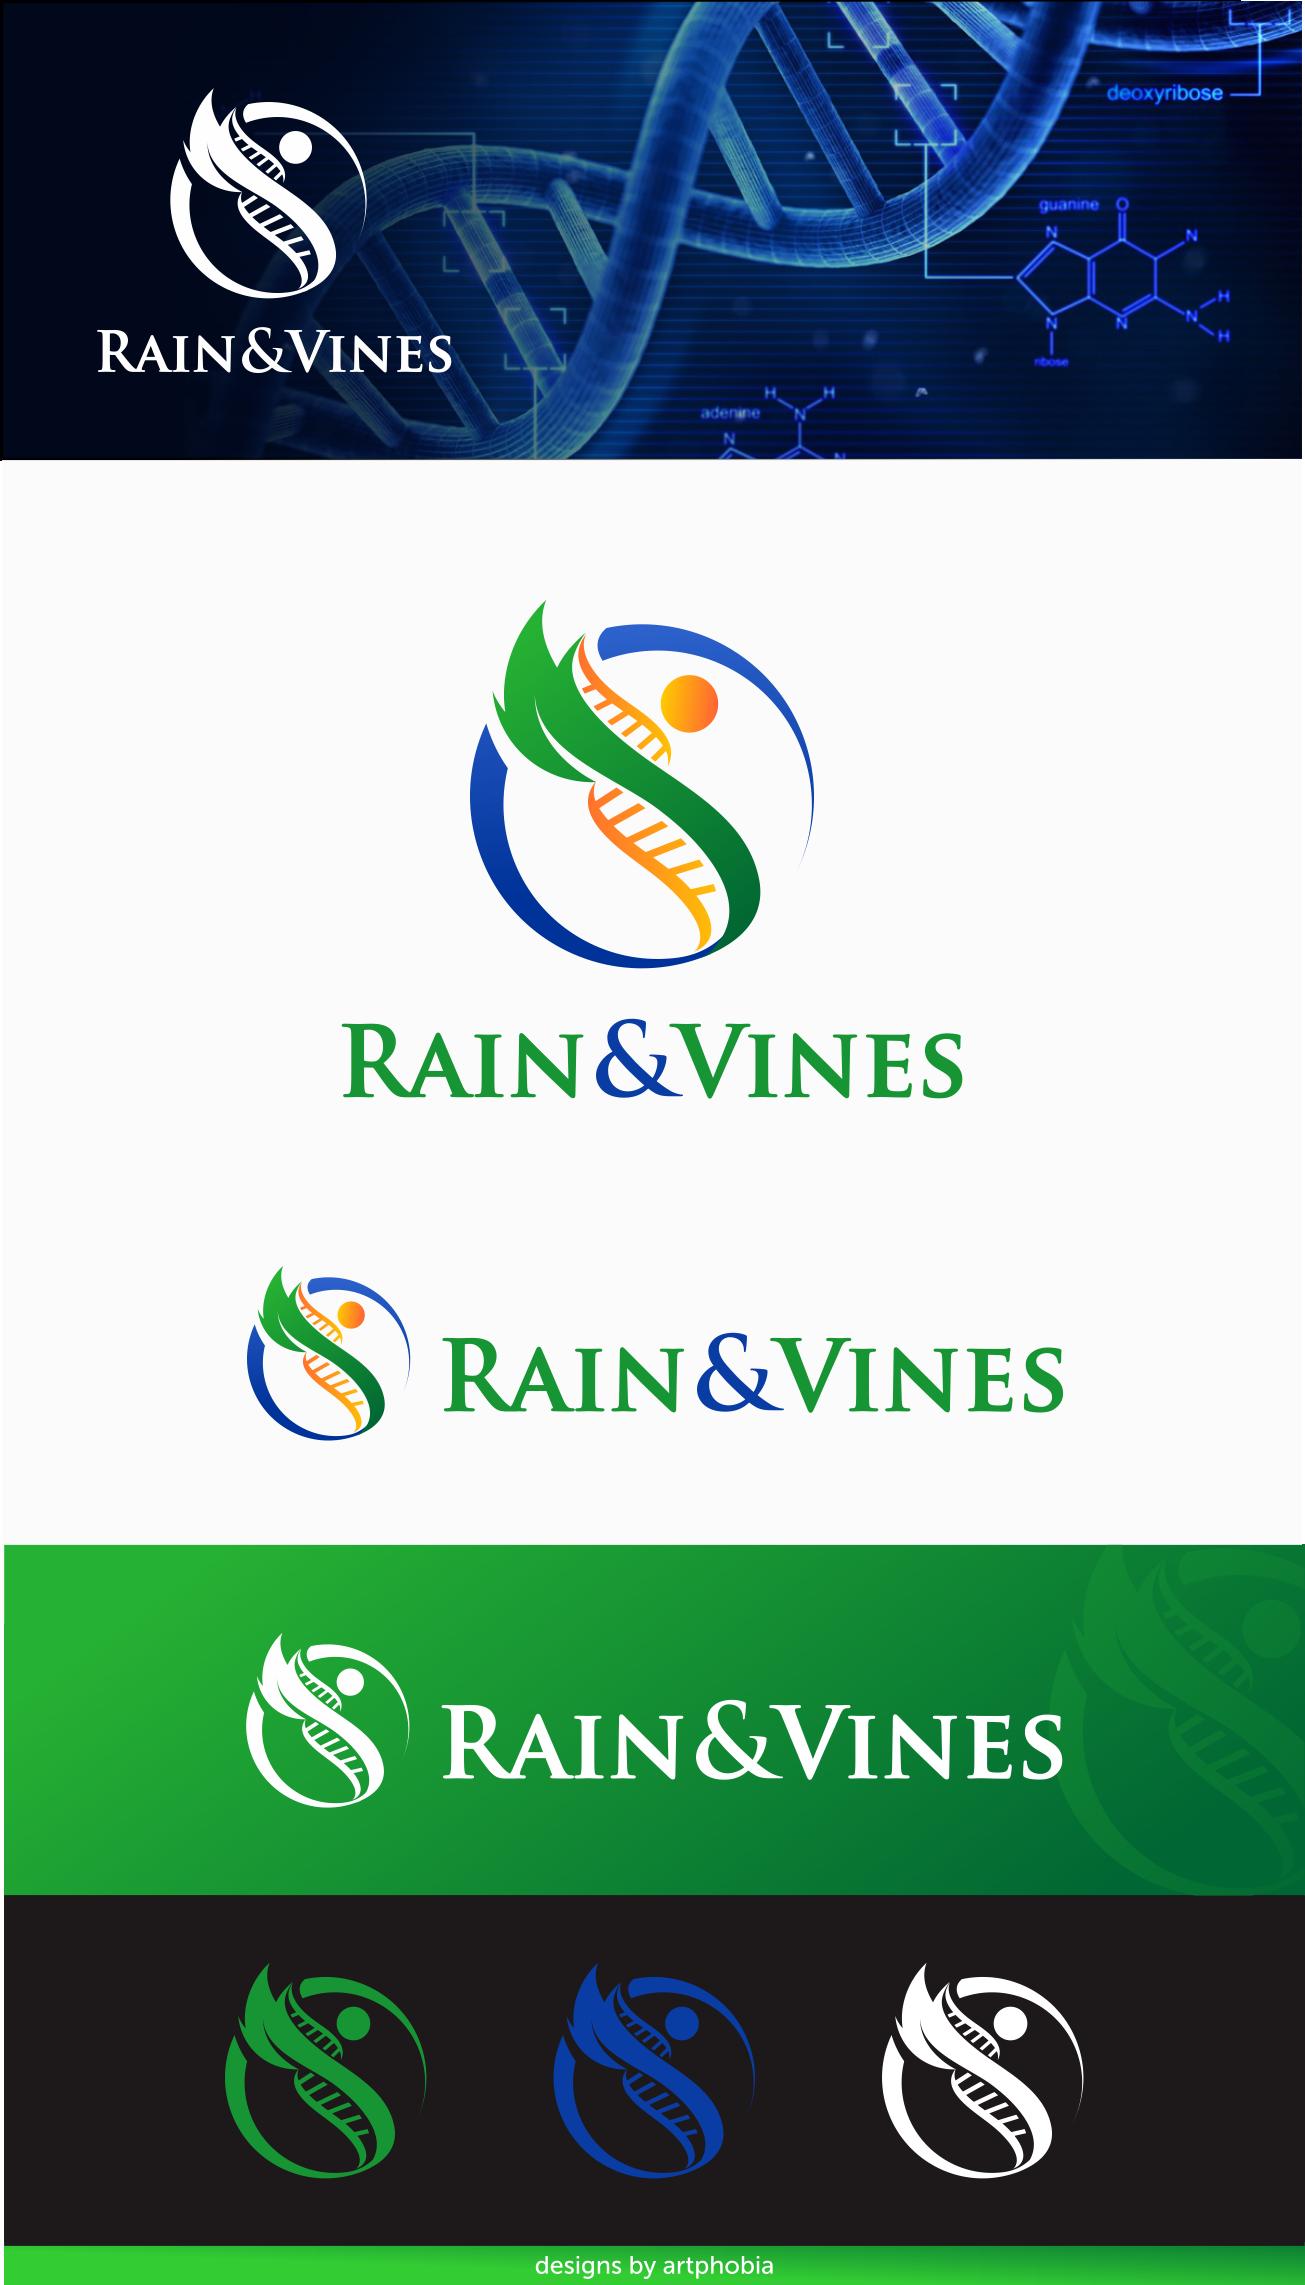 An organic Pharmacy looking for an eyecatching, hip-logo to grab the nutrirional/ organic audience